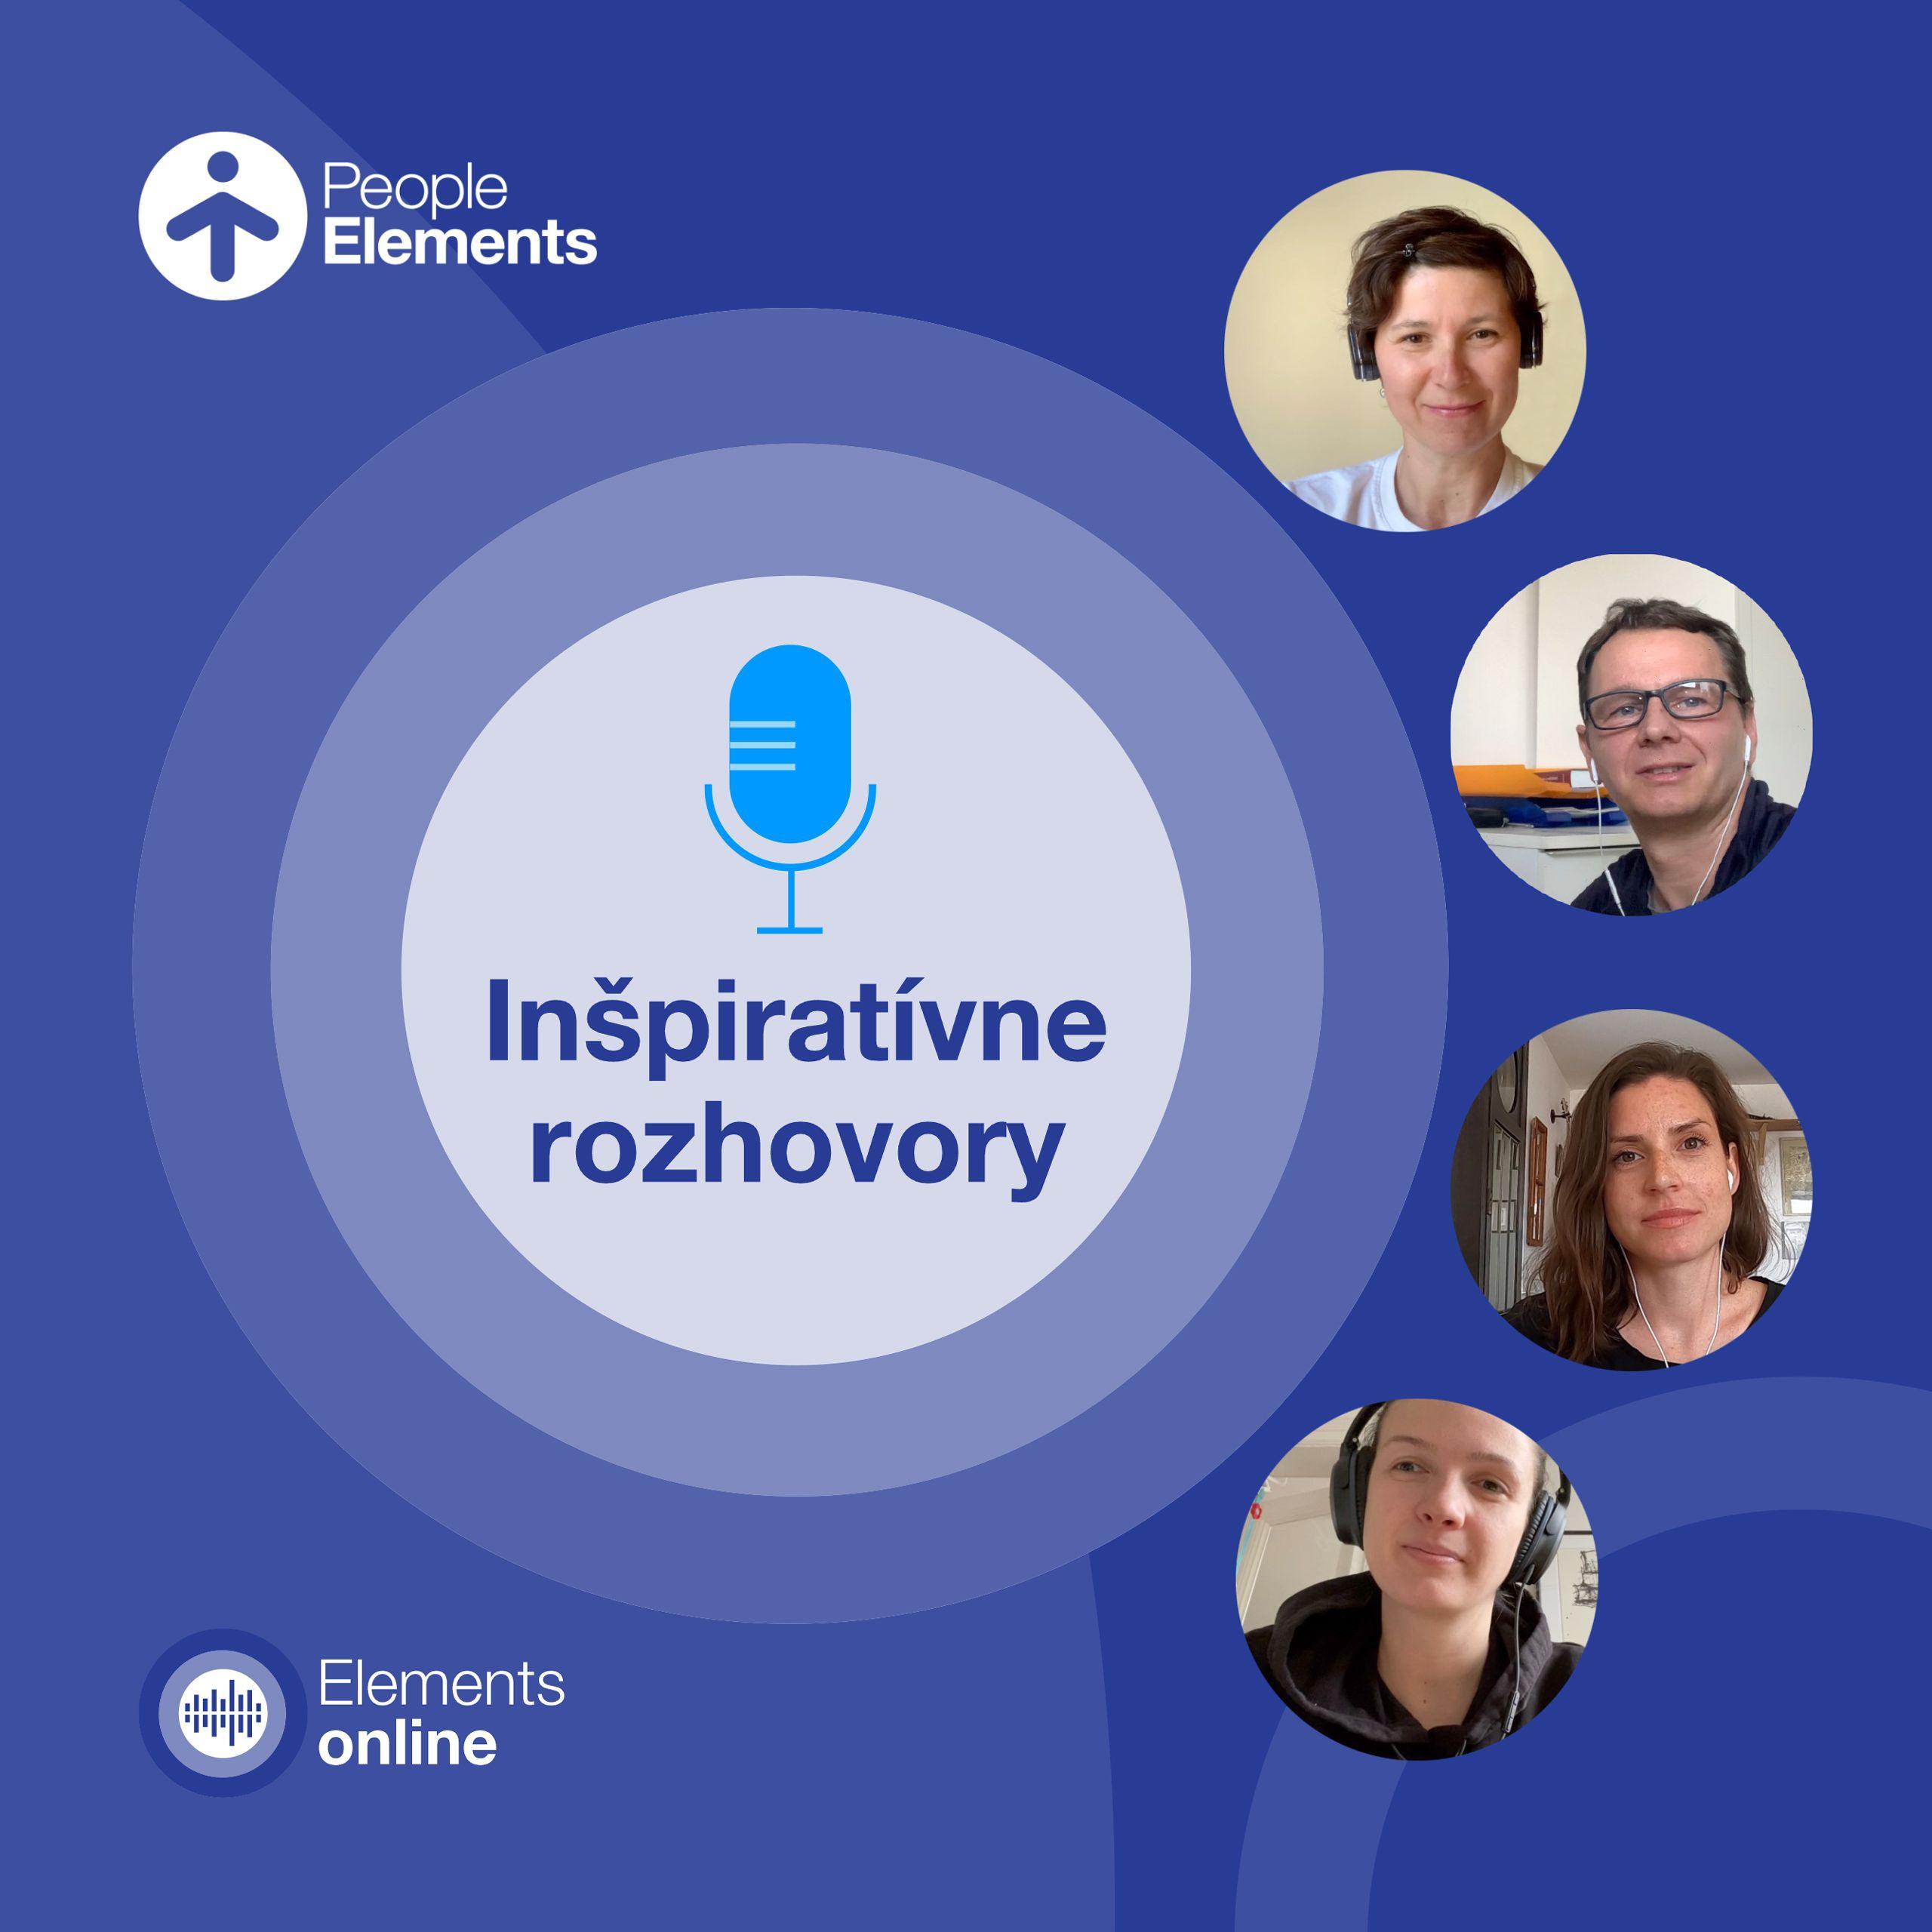 pe-banner-inspirativne-rozhovory-2020-07-27-1920x1920@2x-c